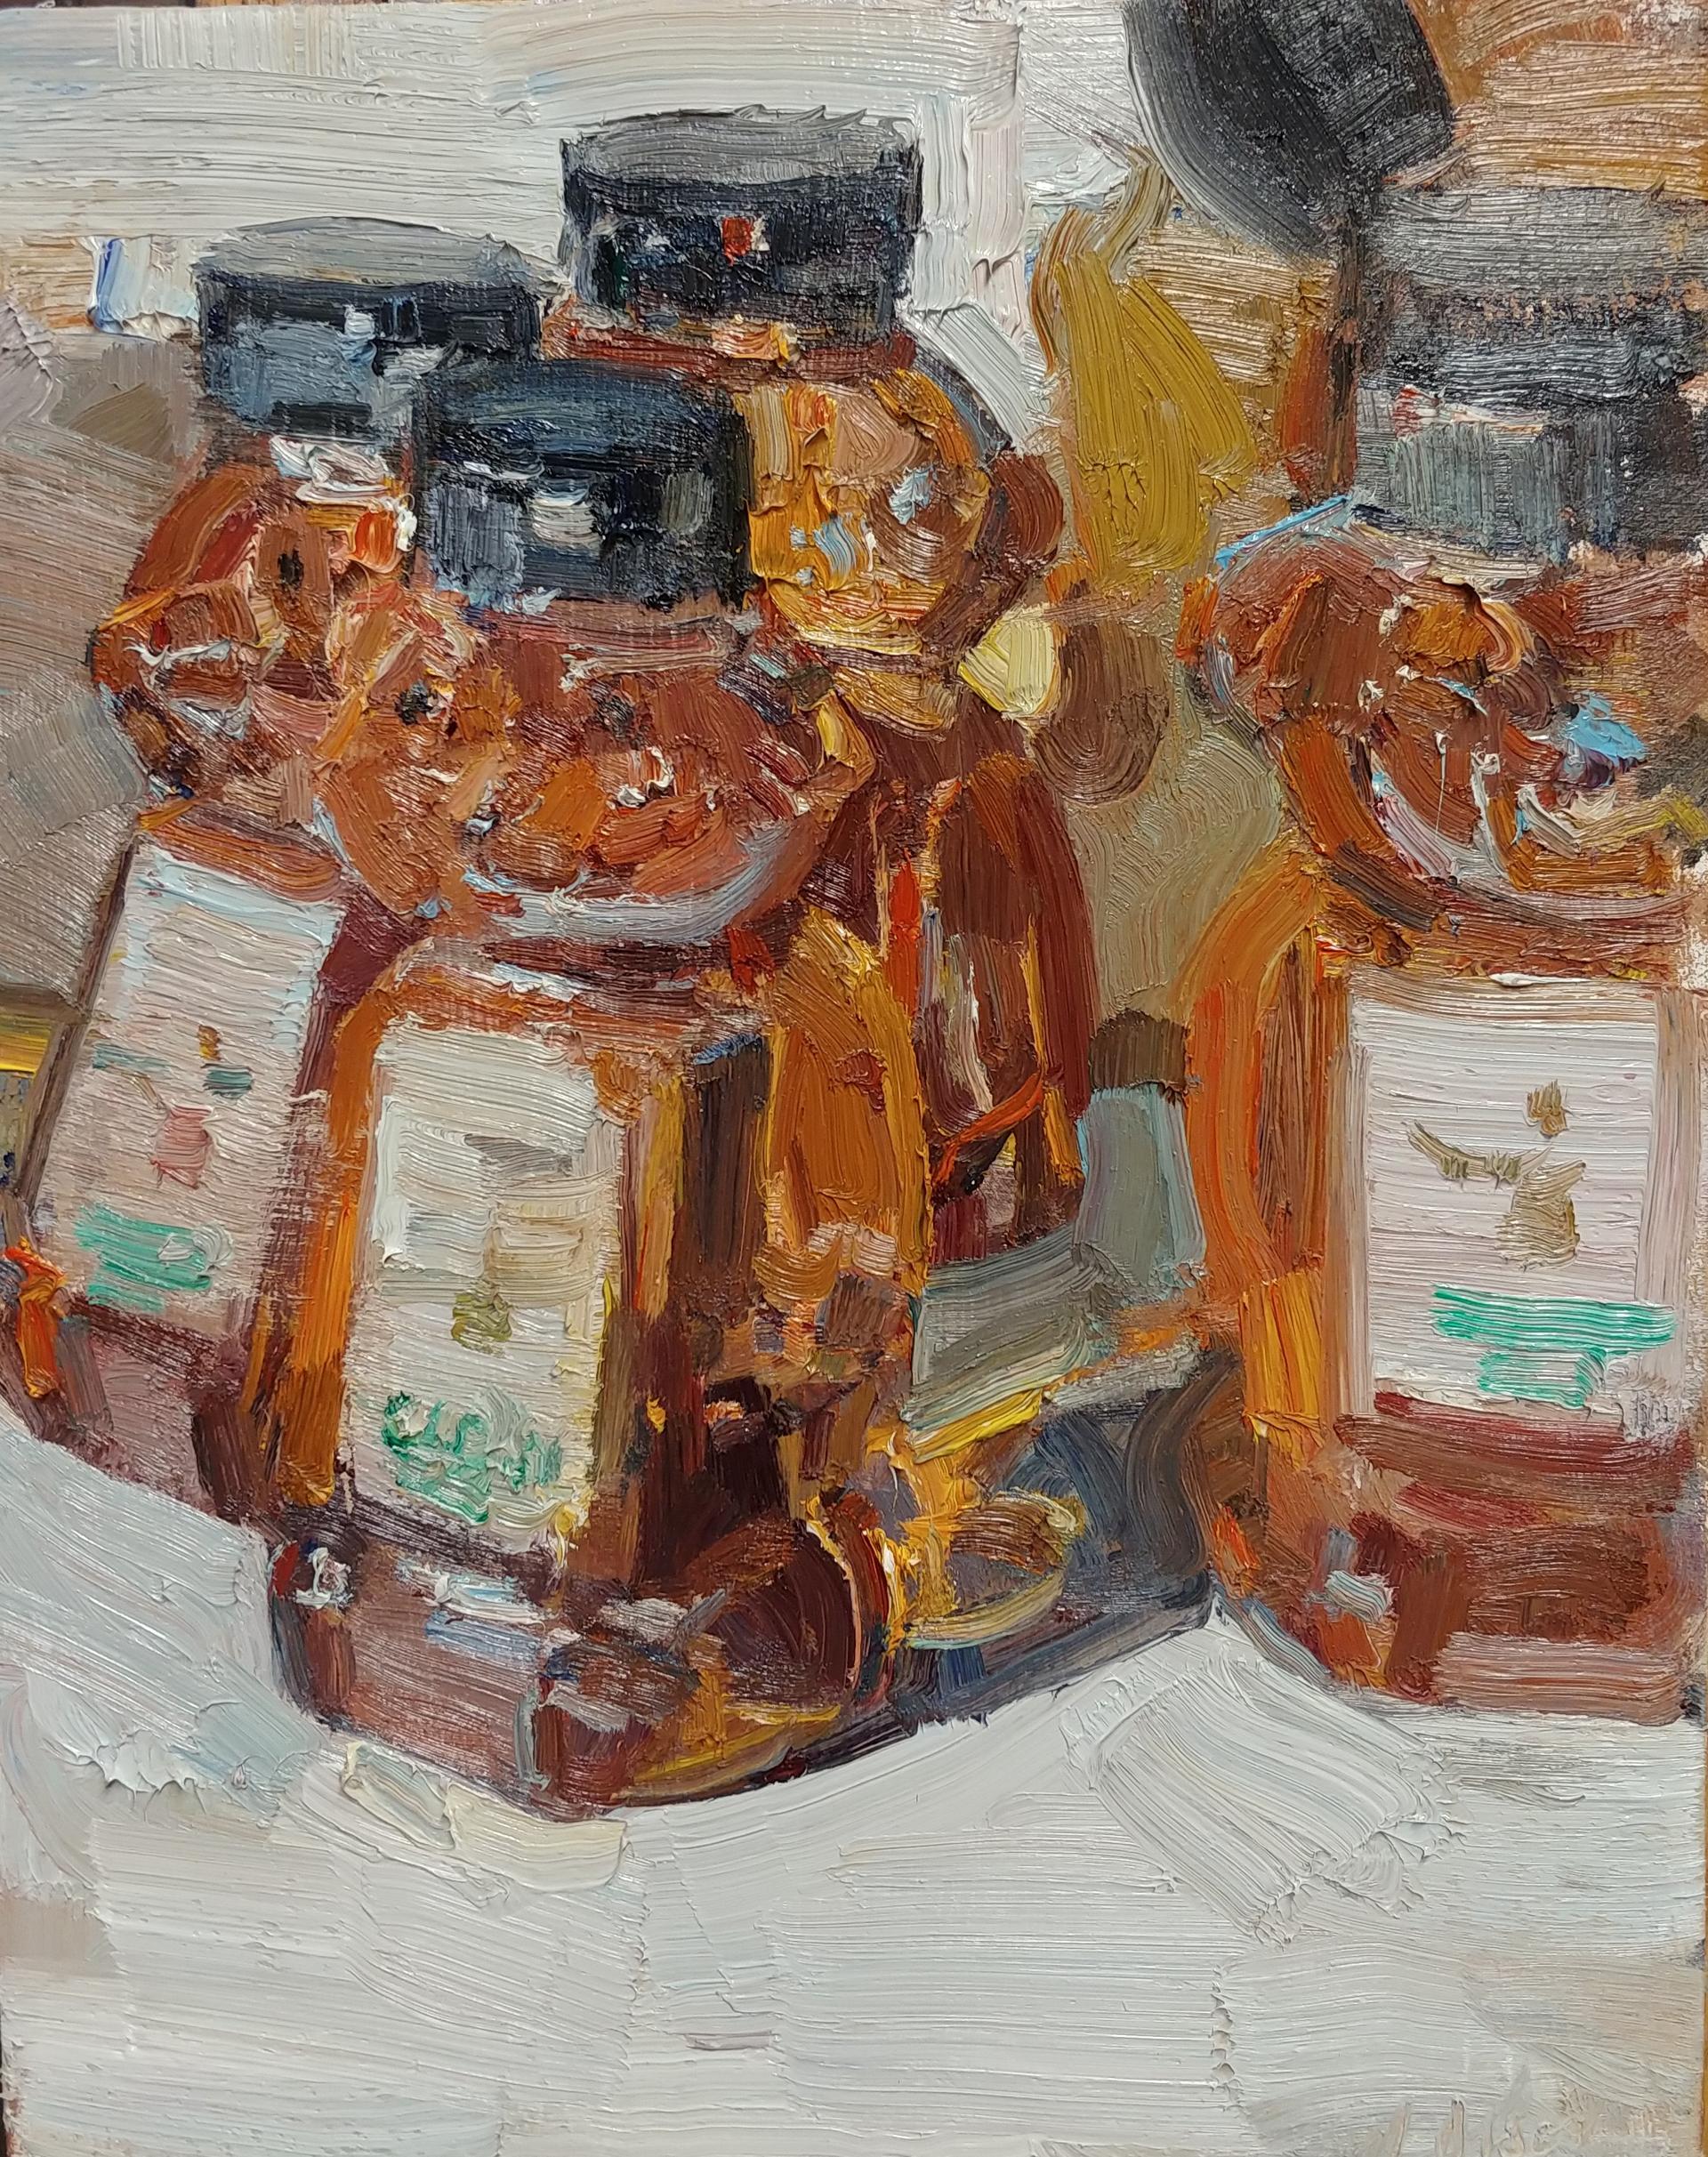 Honey Bears by Mikael Olson